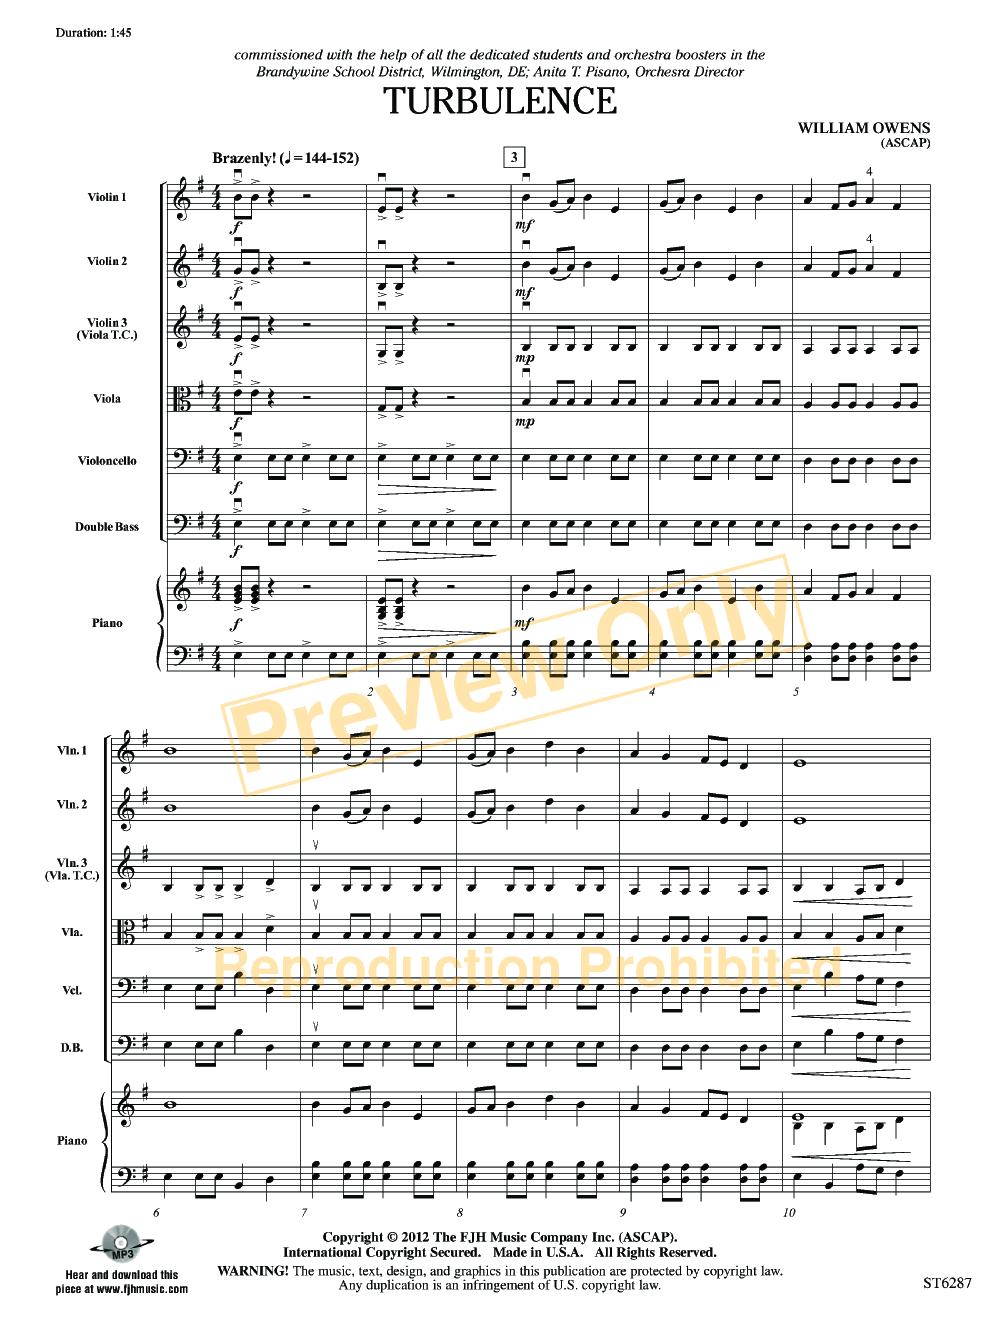 BAIXAR MUSICA TURBULENCE